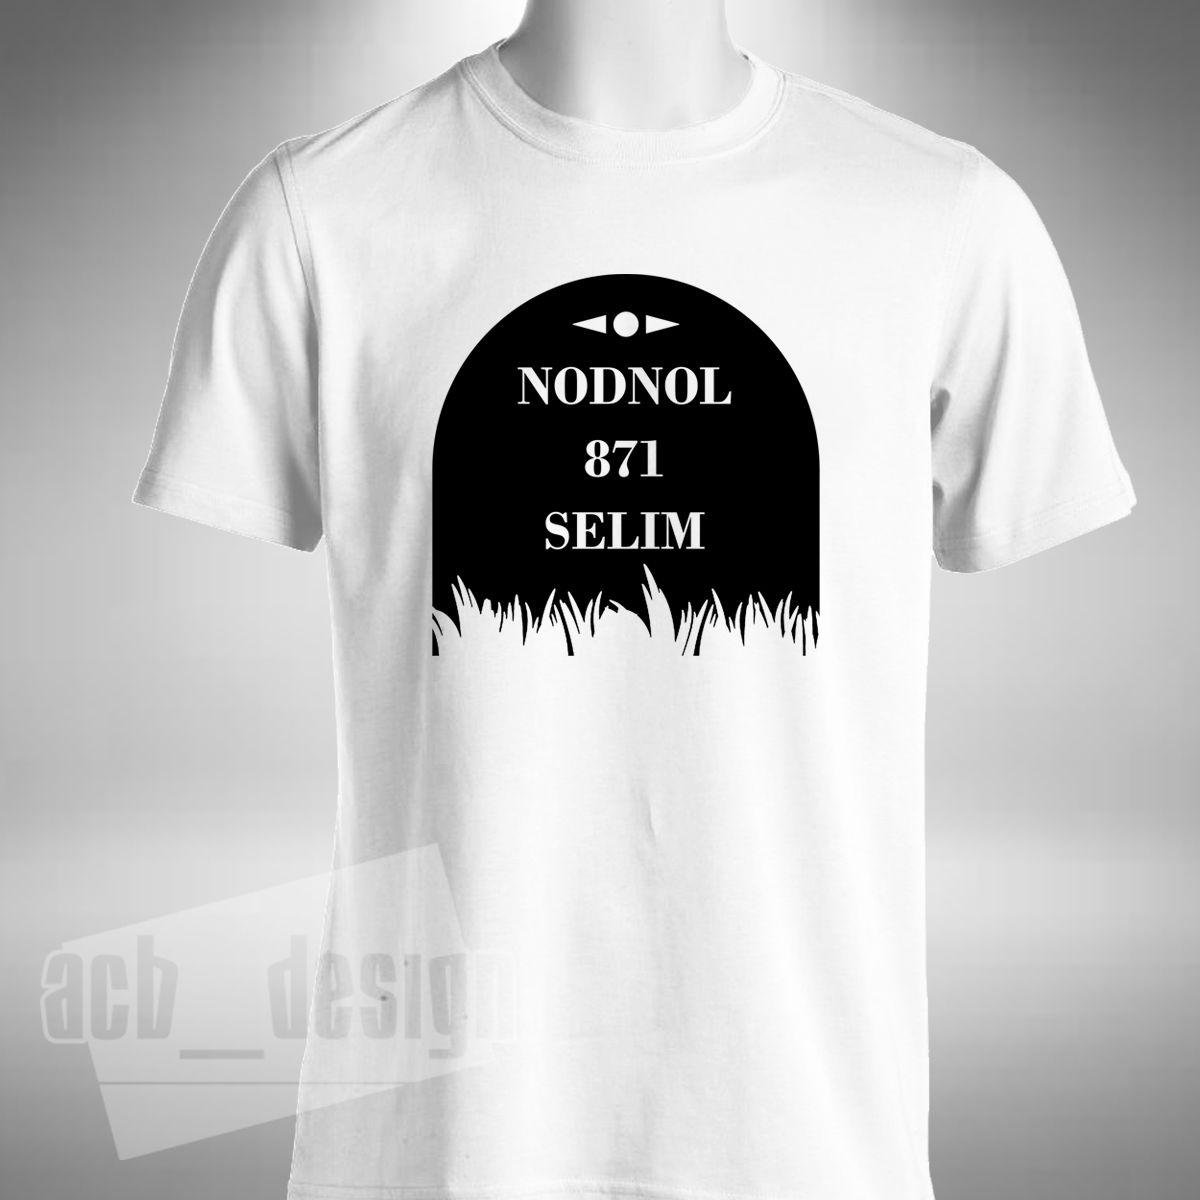 2019 neue Mode T Hemd Nodnol Herren T-shirt Lustige Rot Zwerg Inspiriert Dave Lister Katze London 178 Miles Sommer T-shirt